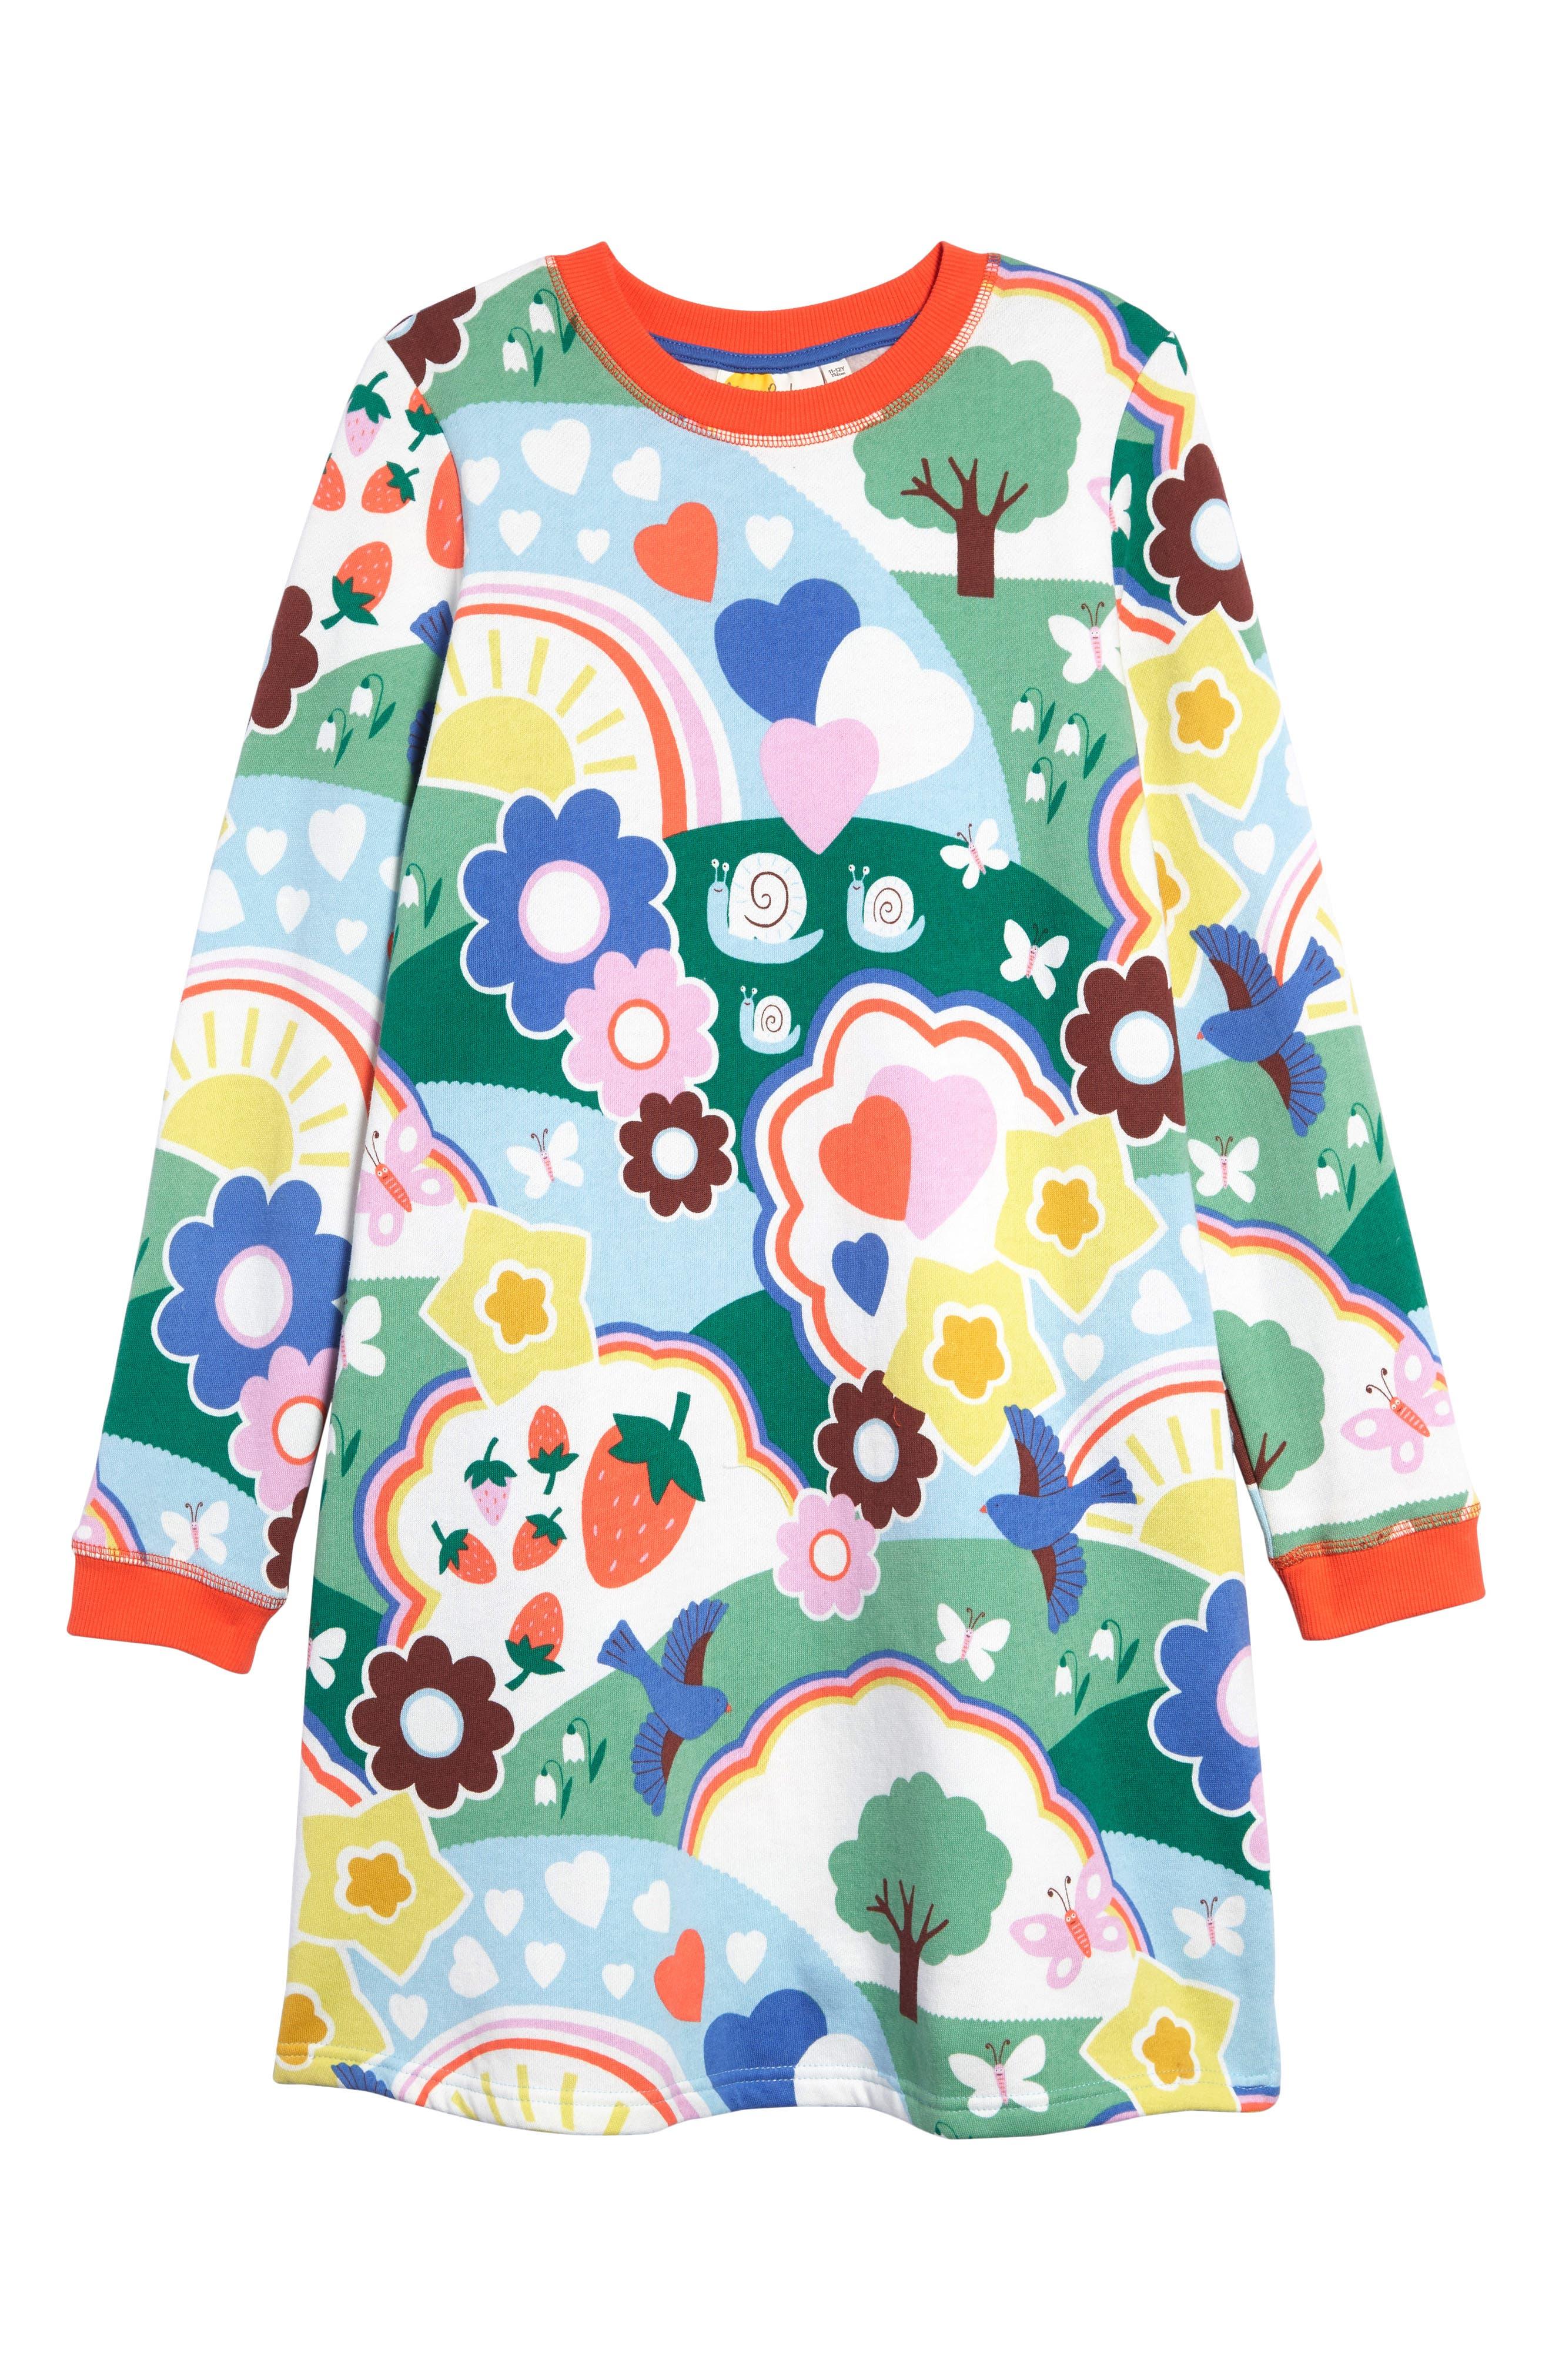 Vintage Style Children's Clothing: Girls, Boys, Baby, Toddler Toddler Girls Boden Print Sweatshirt Dress Size 3-4Y - Green $45.00 AT vintagedancer.com